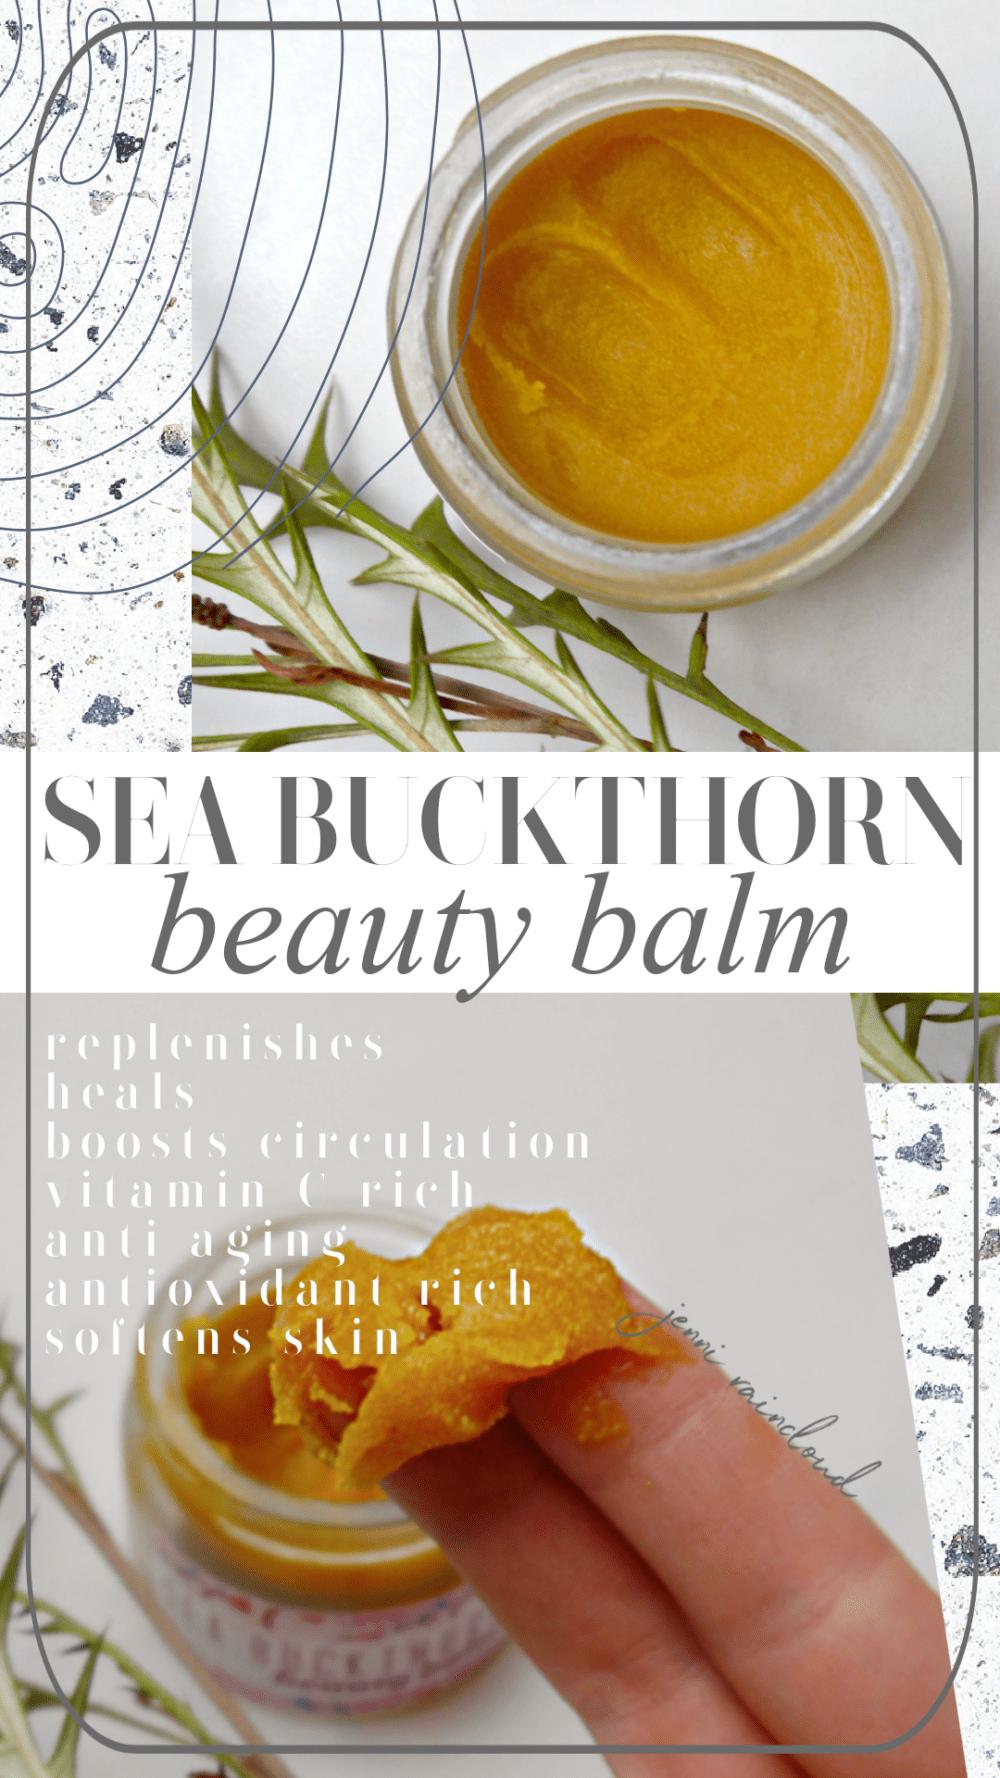 DIY Sea Buckthorn Balm